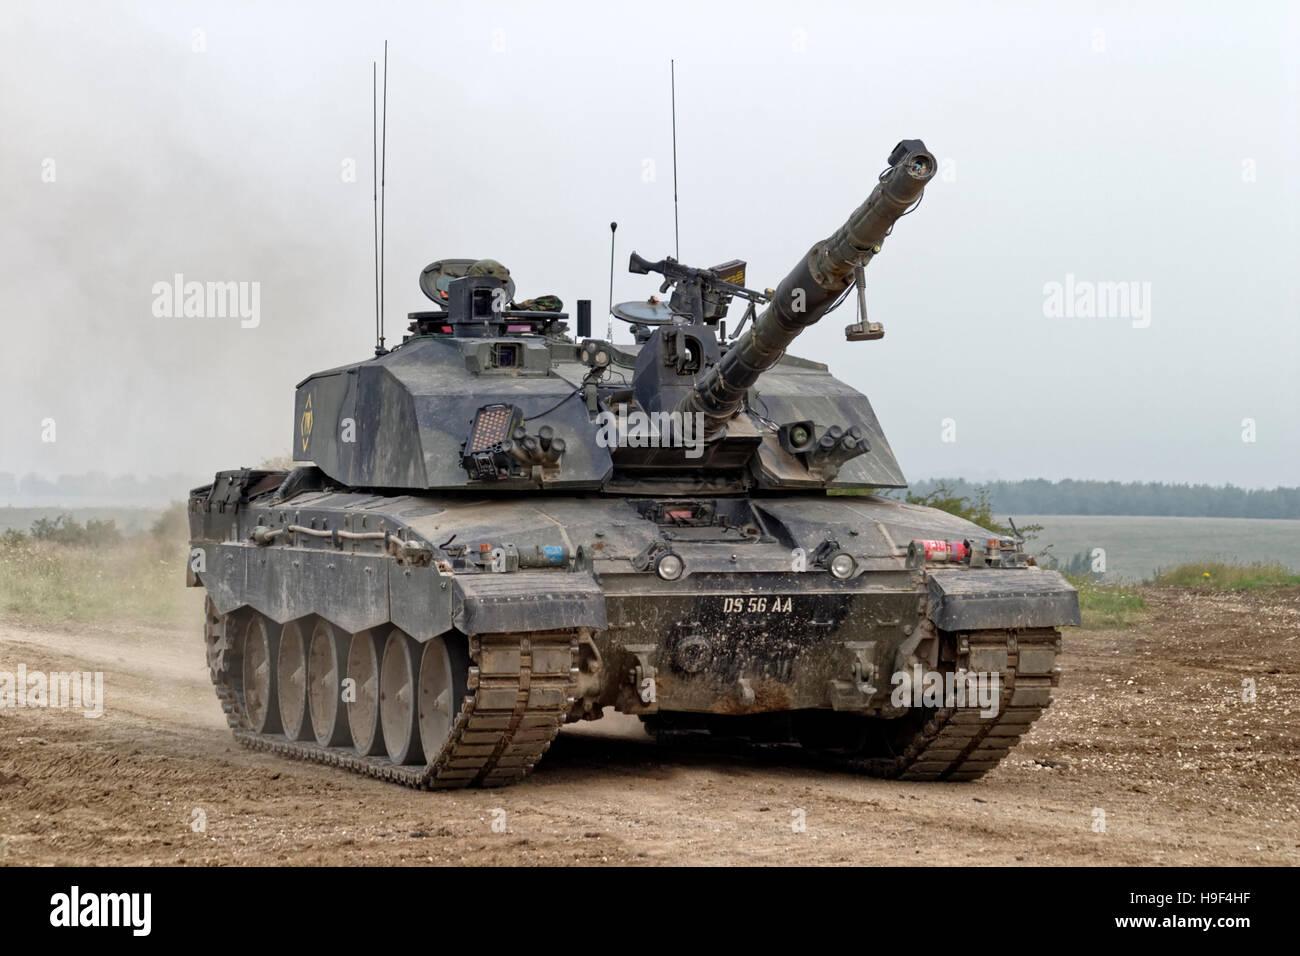 https://c7.alamy.com/comp/H9F4HF/british-army-challenger-2-main-battle-tank-on-the-salisbury-plain-H9F4HF.jpg